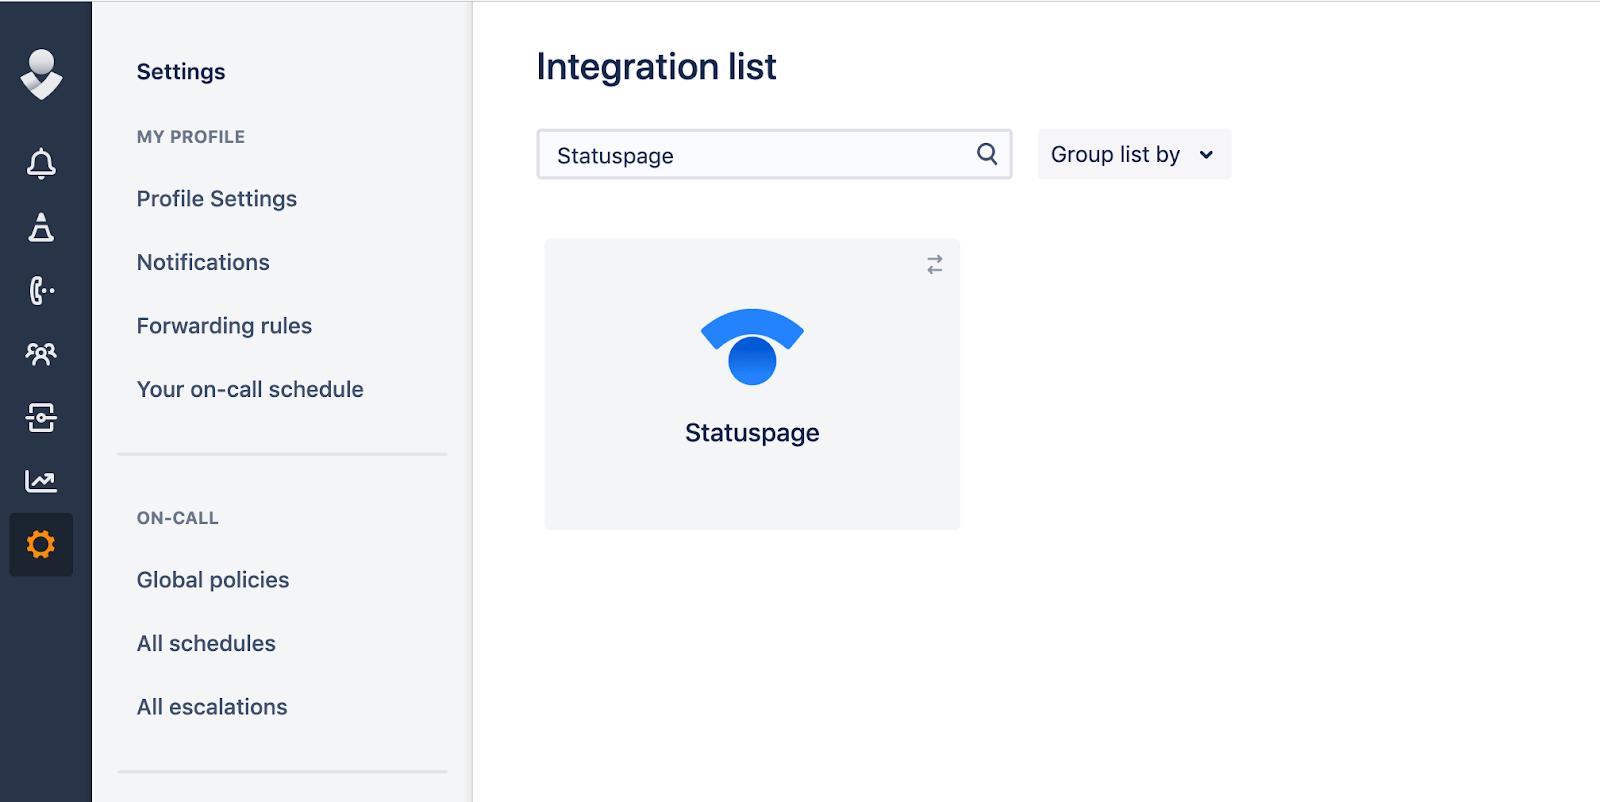 Список интеграций от Opsgenie